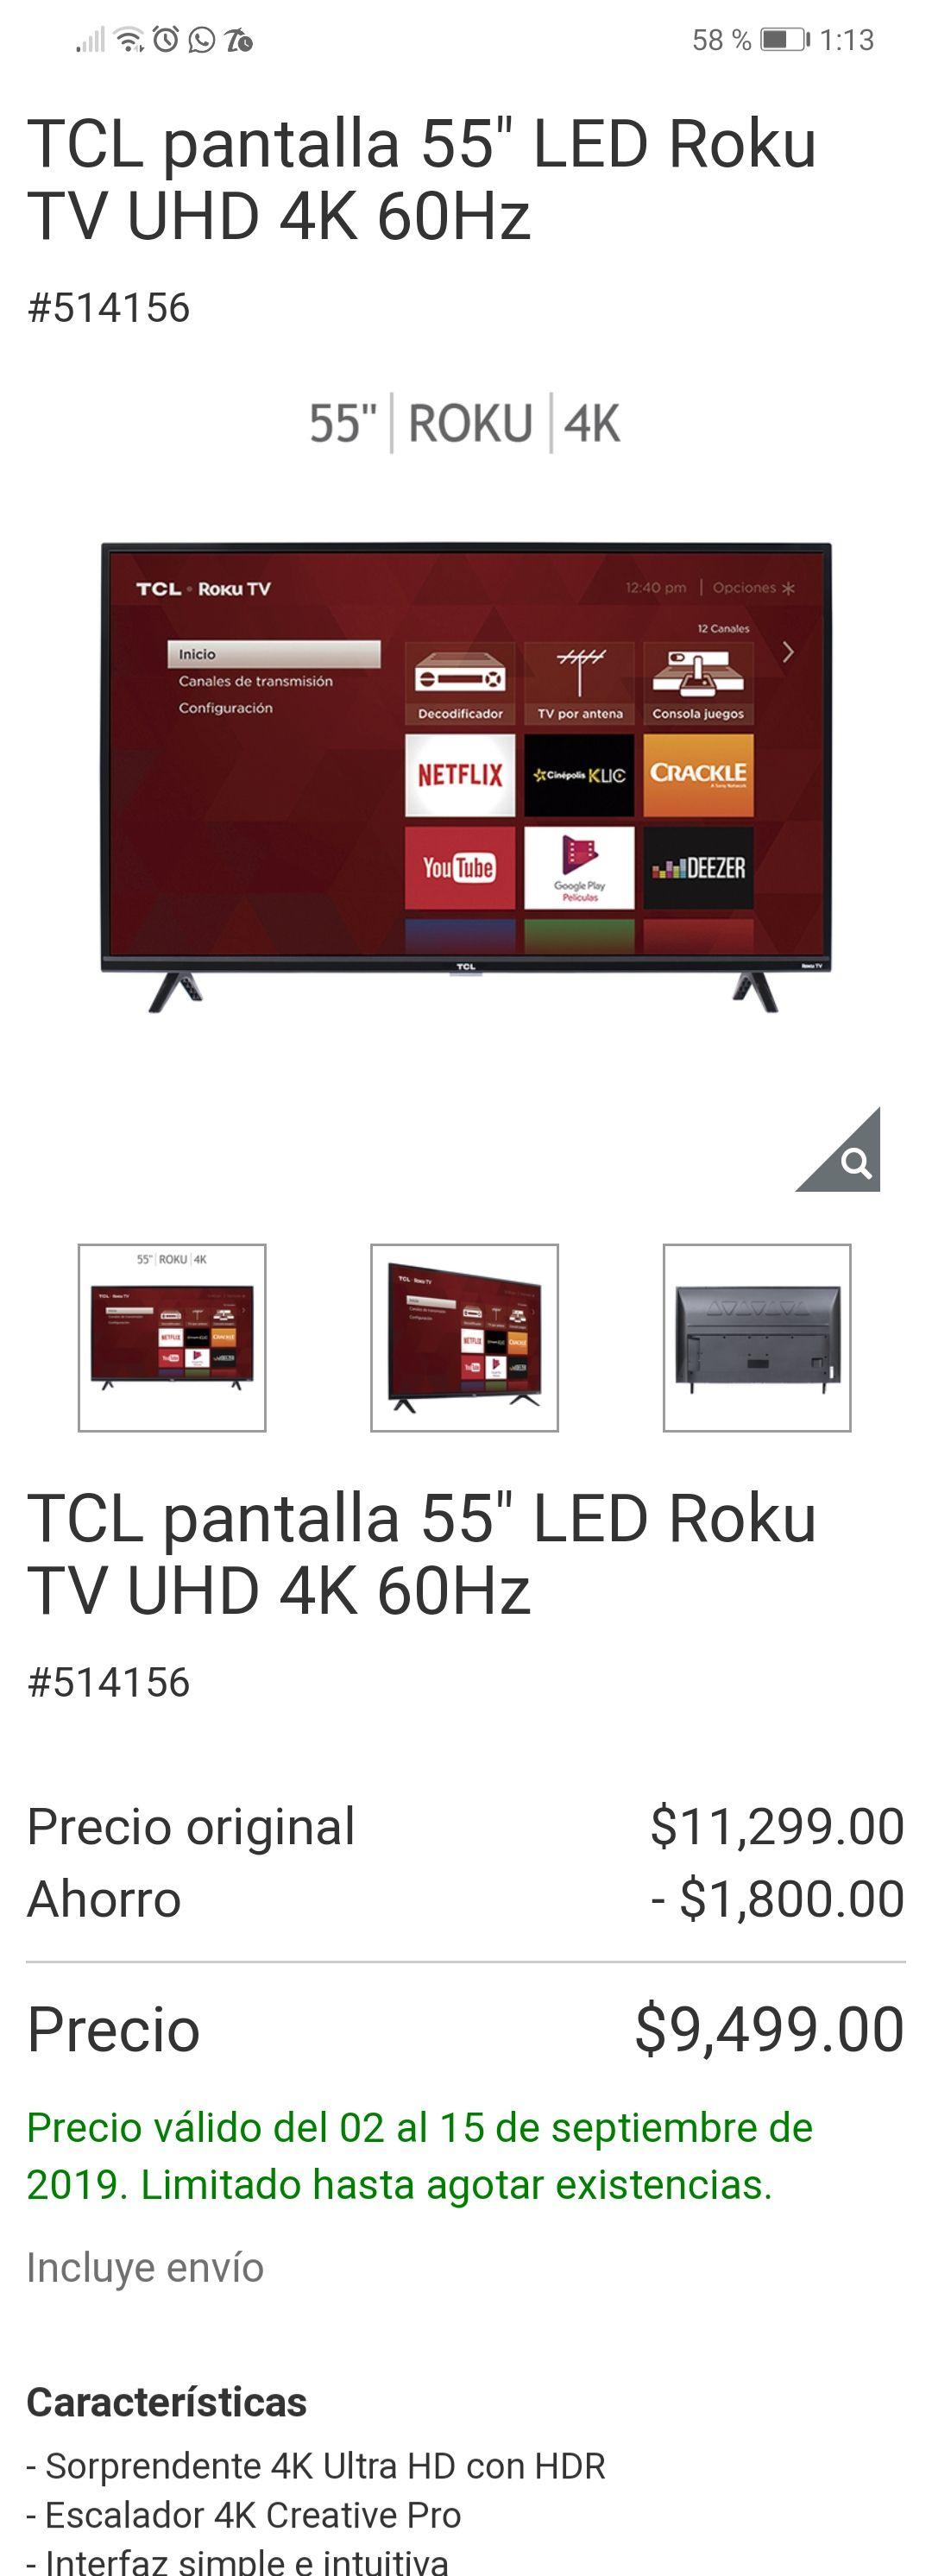 "Costco TCL pantalla 55"" LED Roku TV UHD 4K 60Hz y lámpara de mesa"